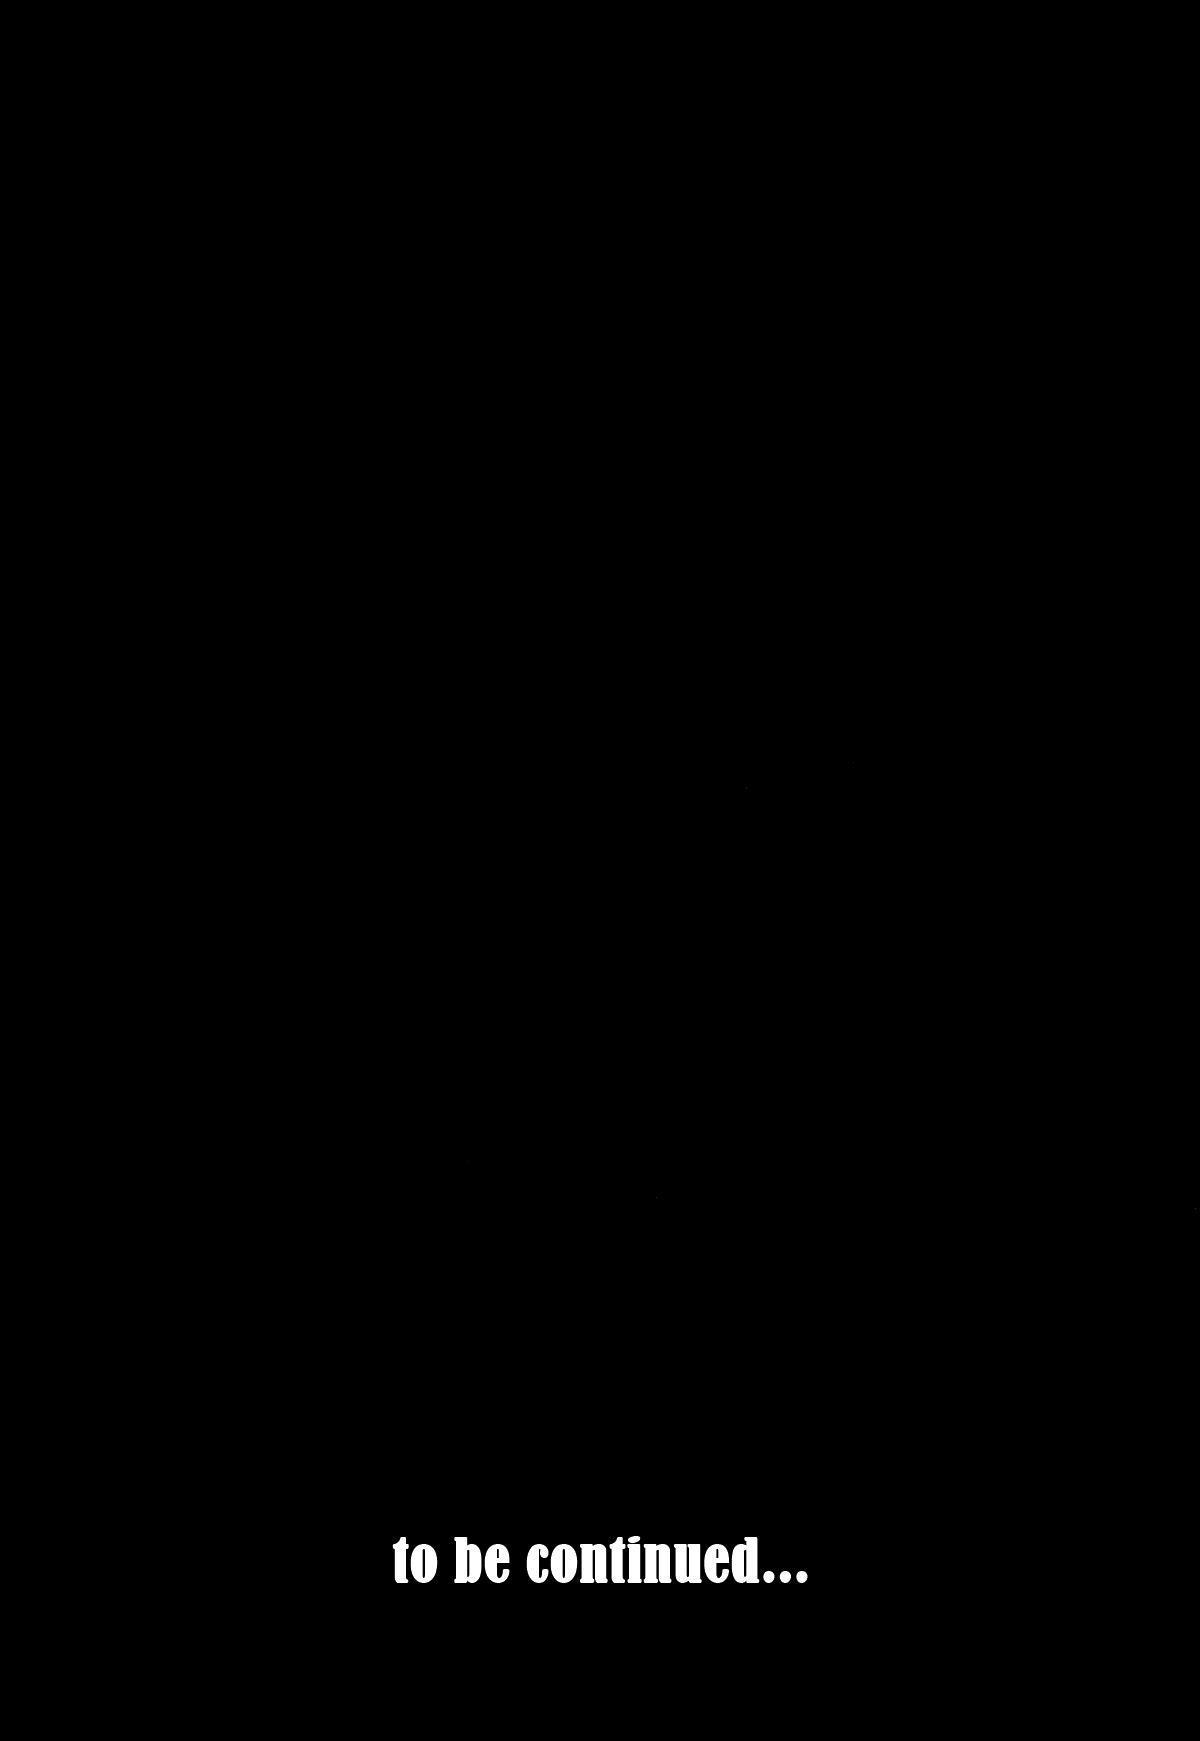 [Eromazun (Ma-Kurou)] Saint Helena Gakuen ~ Terrorist ni Senkyosareta Jogakuen de Rape Matsuri!~   Saint Helena Academy ~A School Occupied by Terrorists Becomes a Rape Festival!~ (Various) [English] [B.E.C. Scans] 34